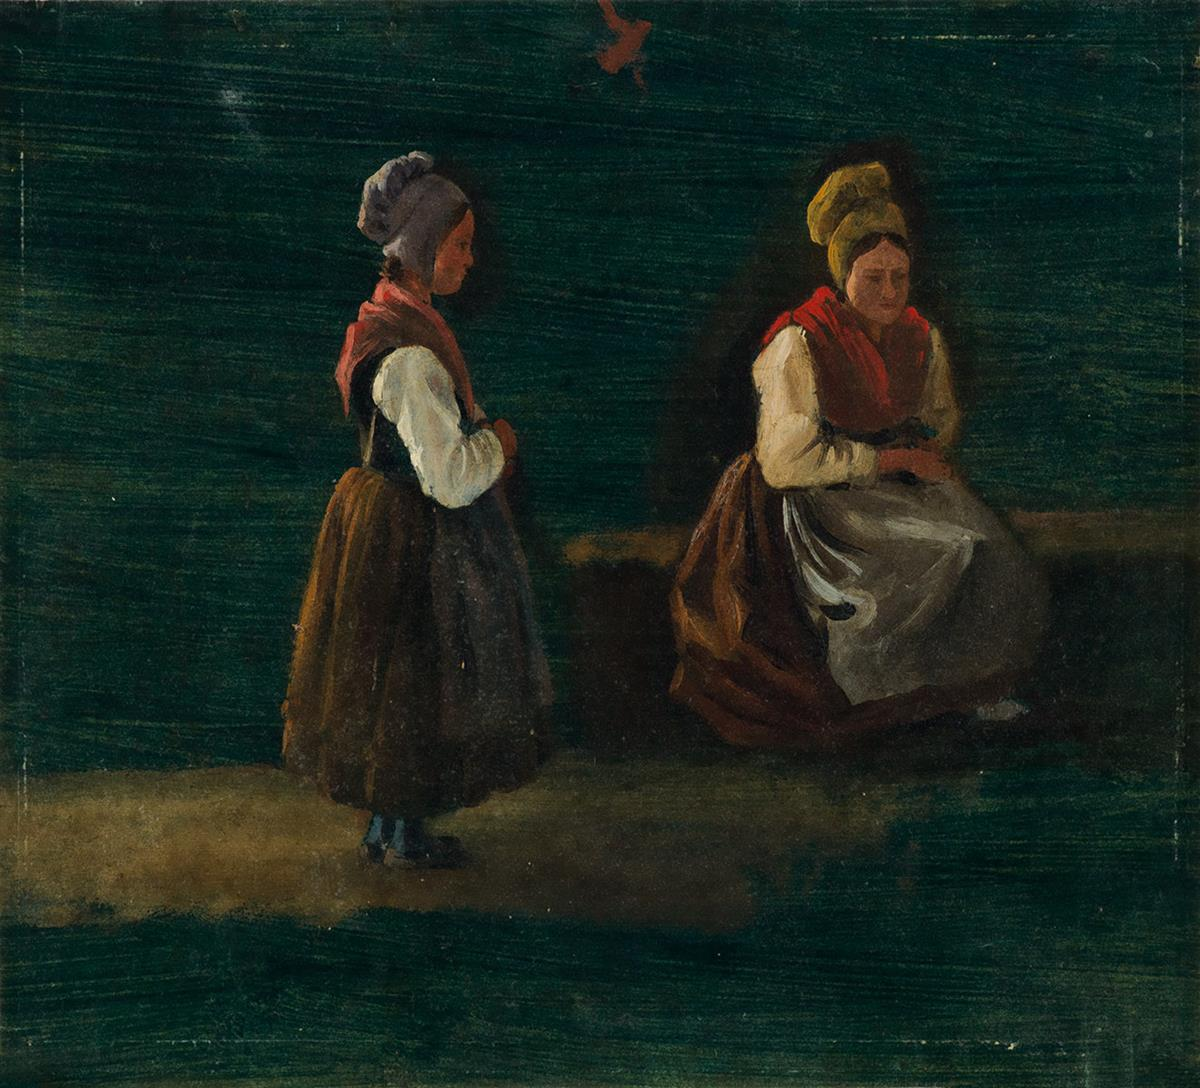 PROSPER FRANÇOIS IRÉNÉE BARRIGUE, CALLED FONTAINIEU (Marseille 1760-1850 Marseille) Study of Two Women.